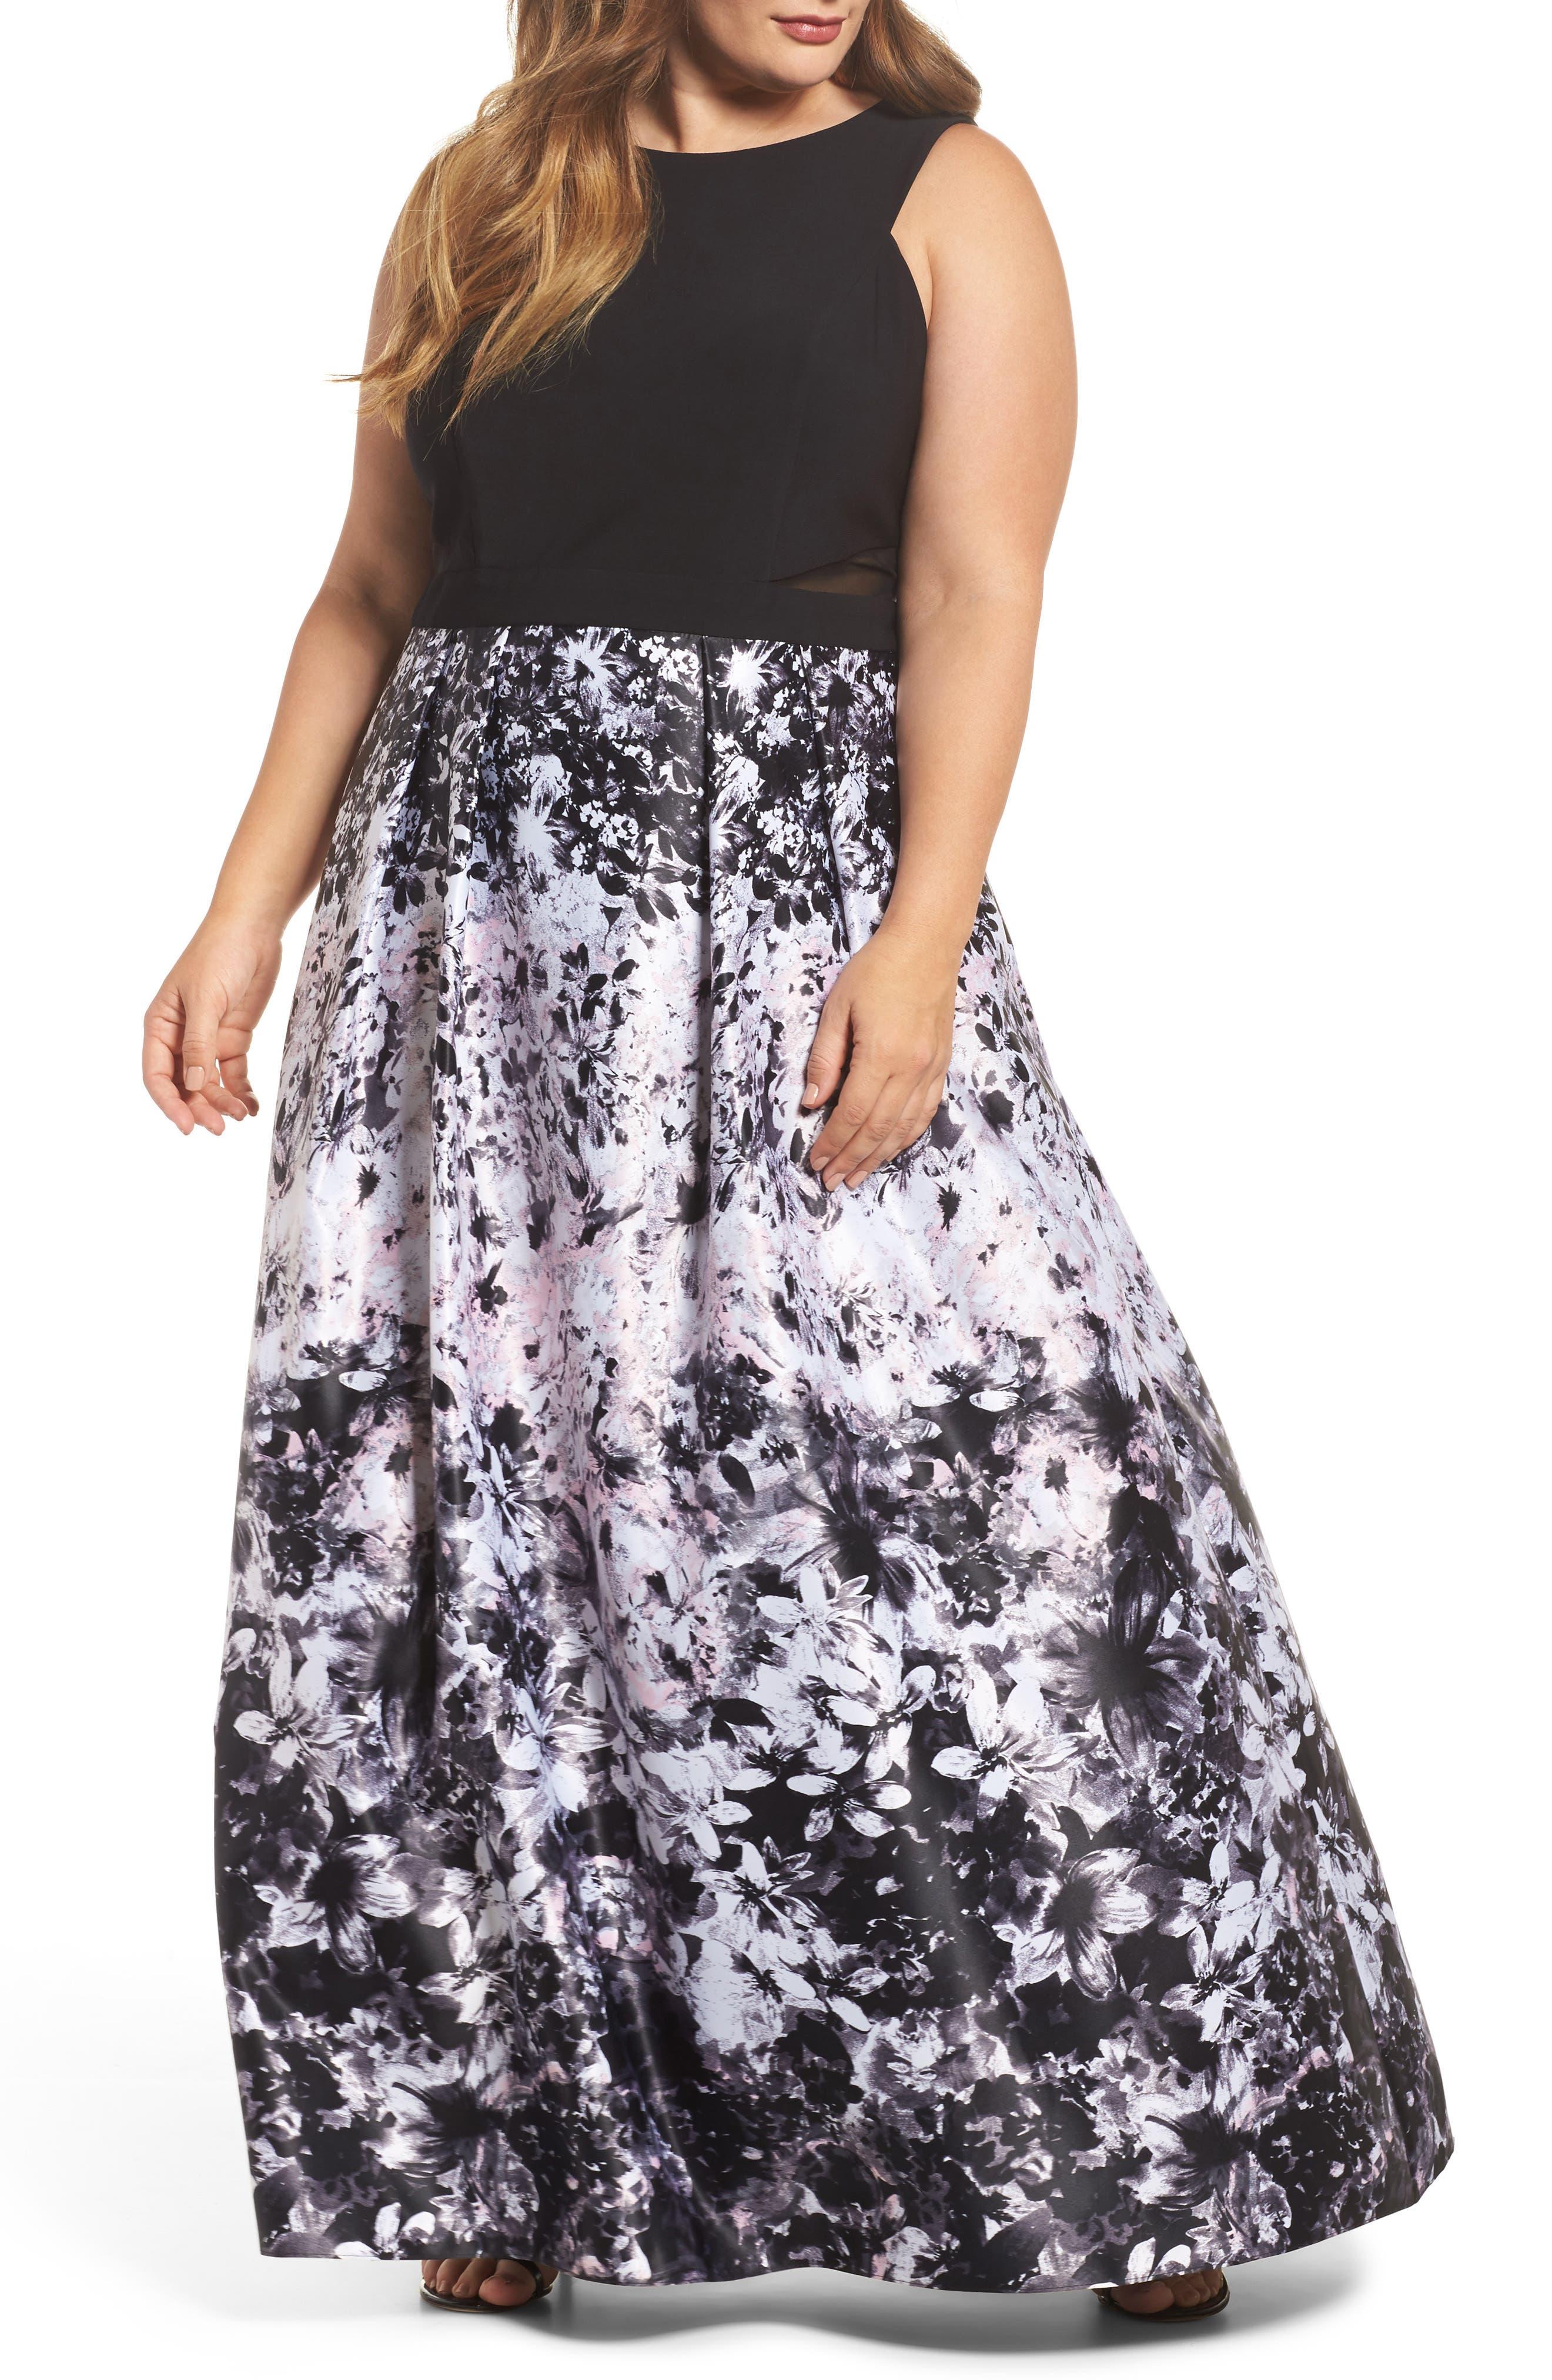 Alternate Image 1 Selected - Xscape Floral Print Ballgown (Plus Size)